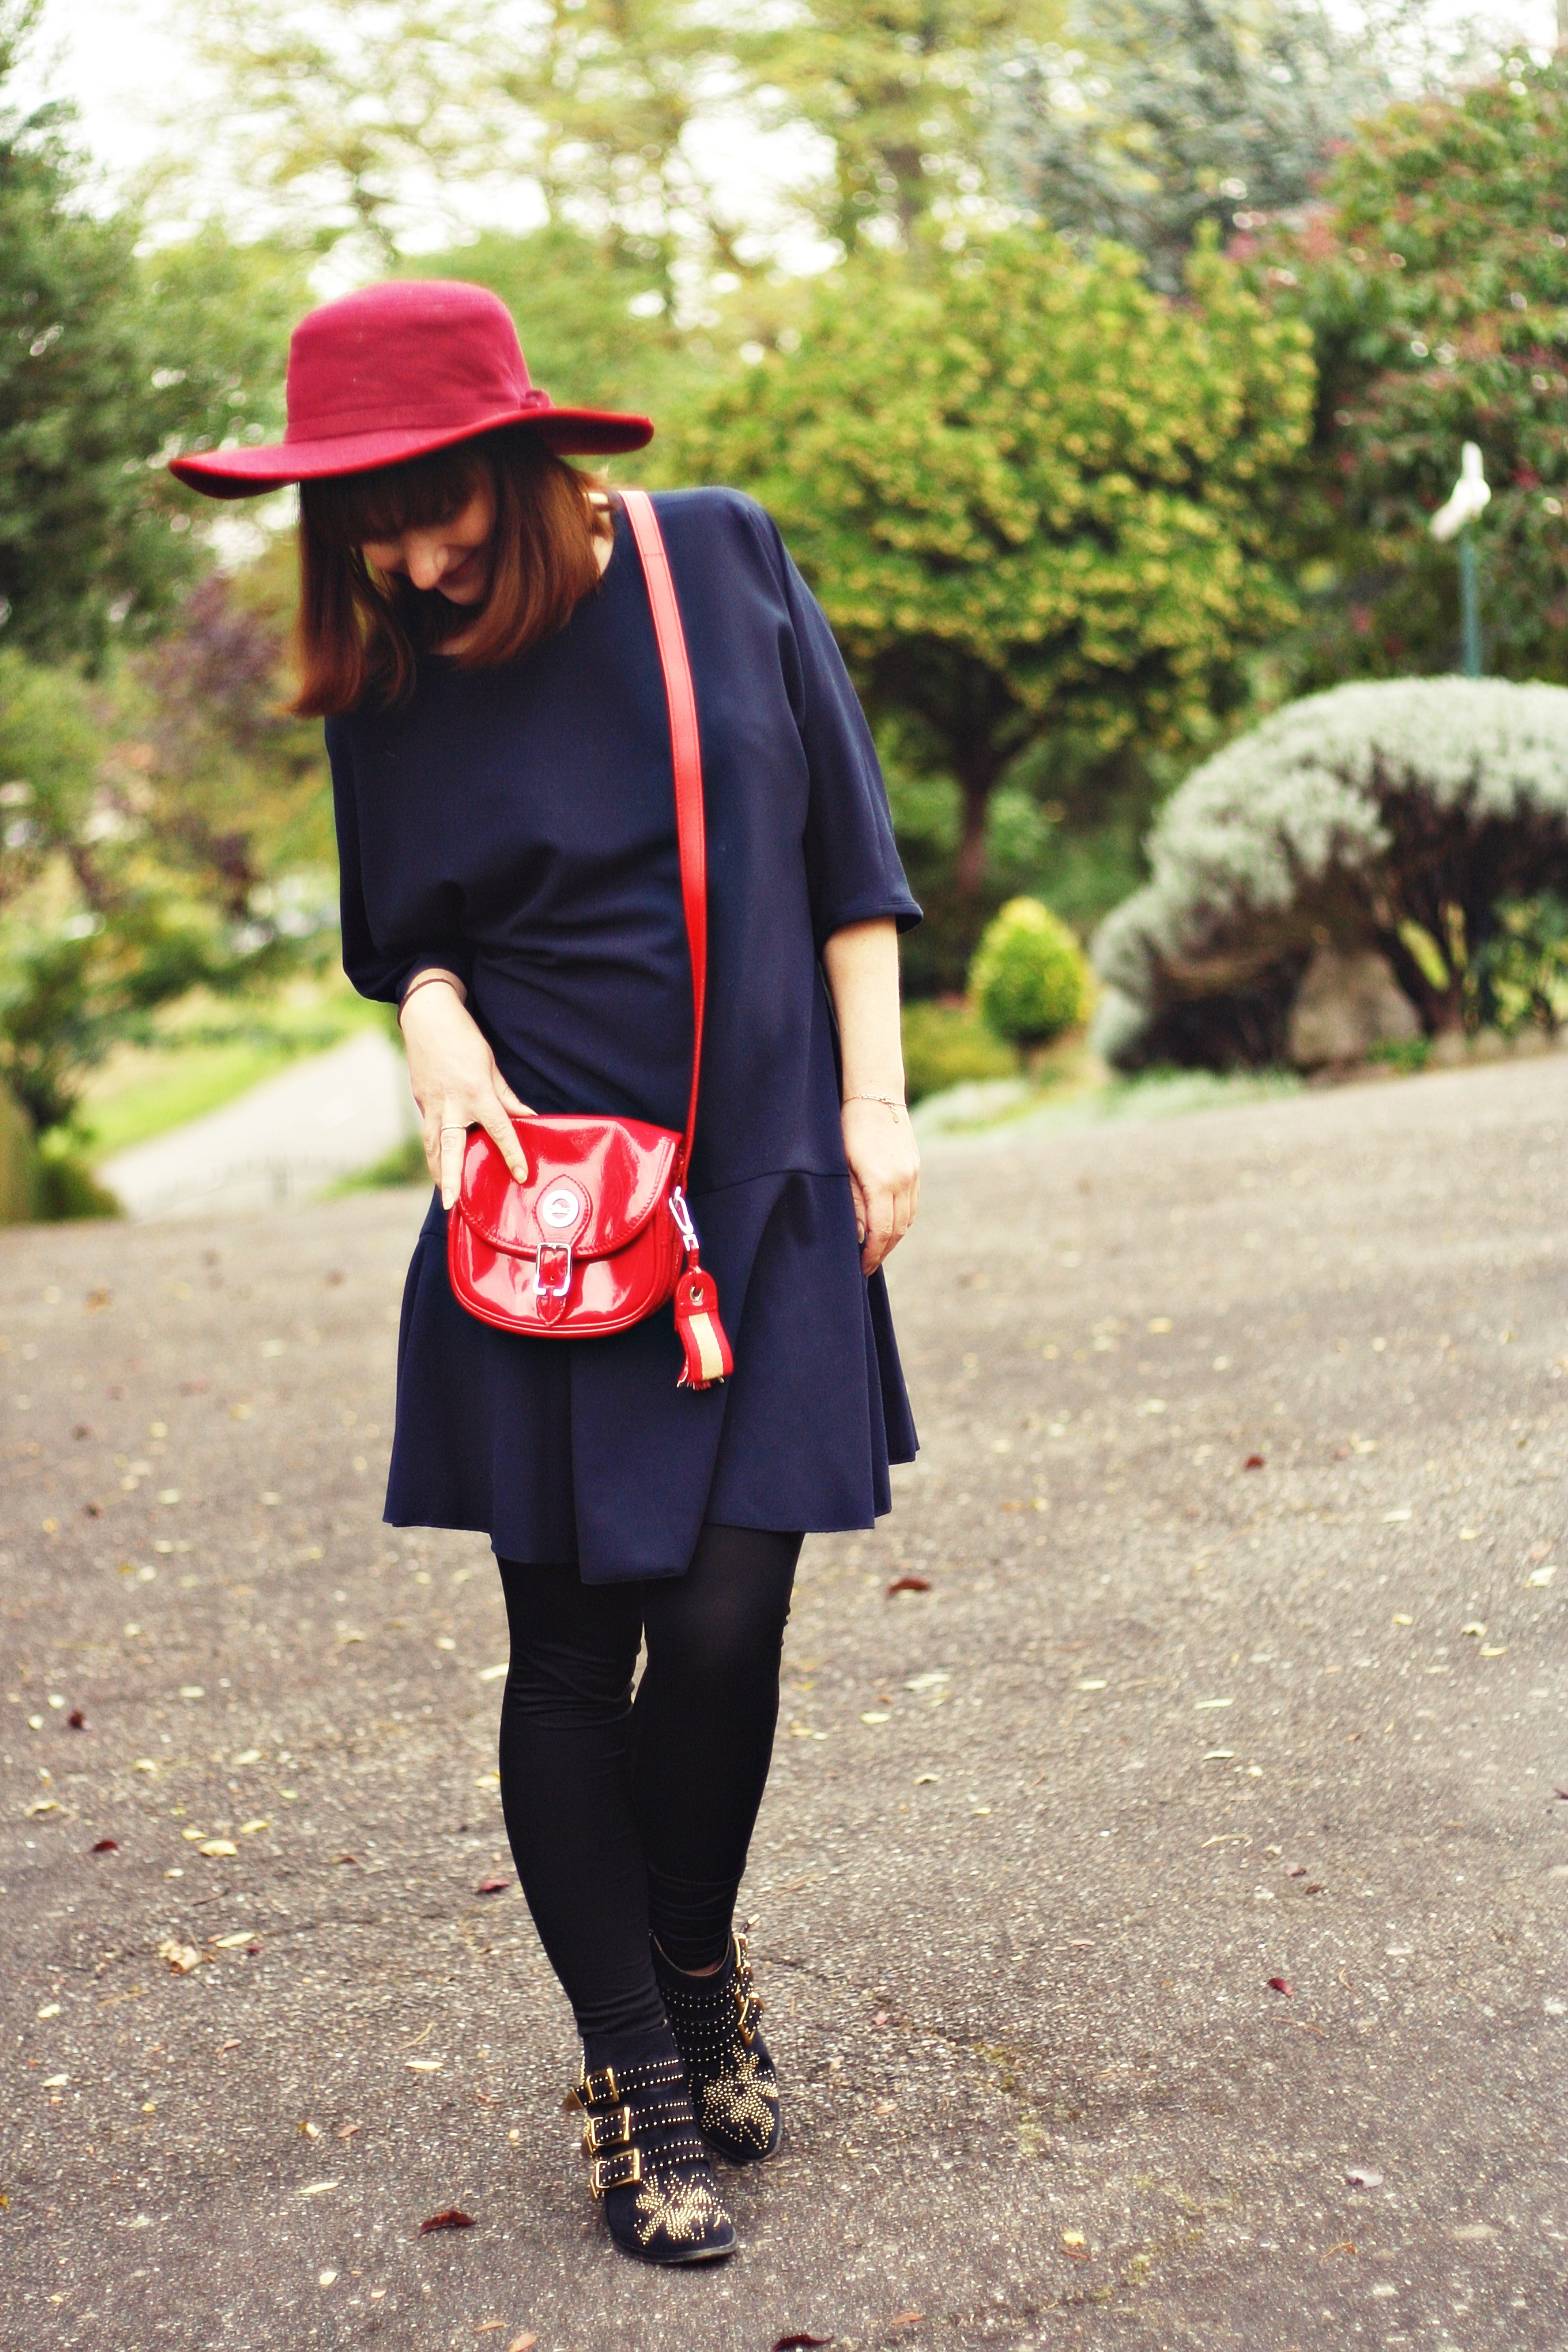 tara-jarmon-boots-susanna-chloe-longchamp-bag-look-susanna-chloe-mini-longchamp